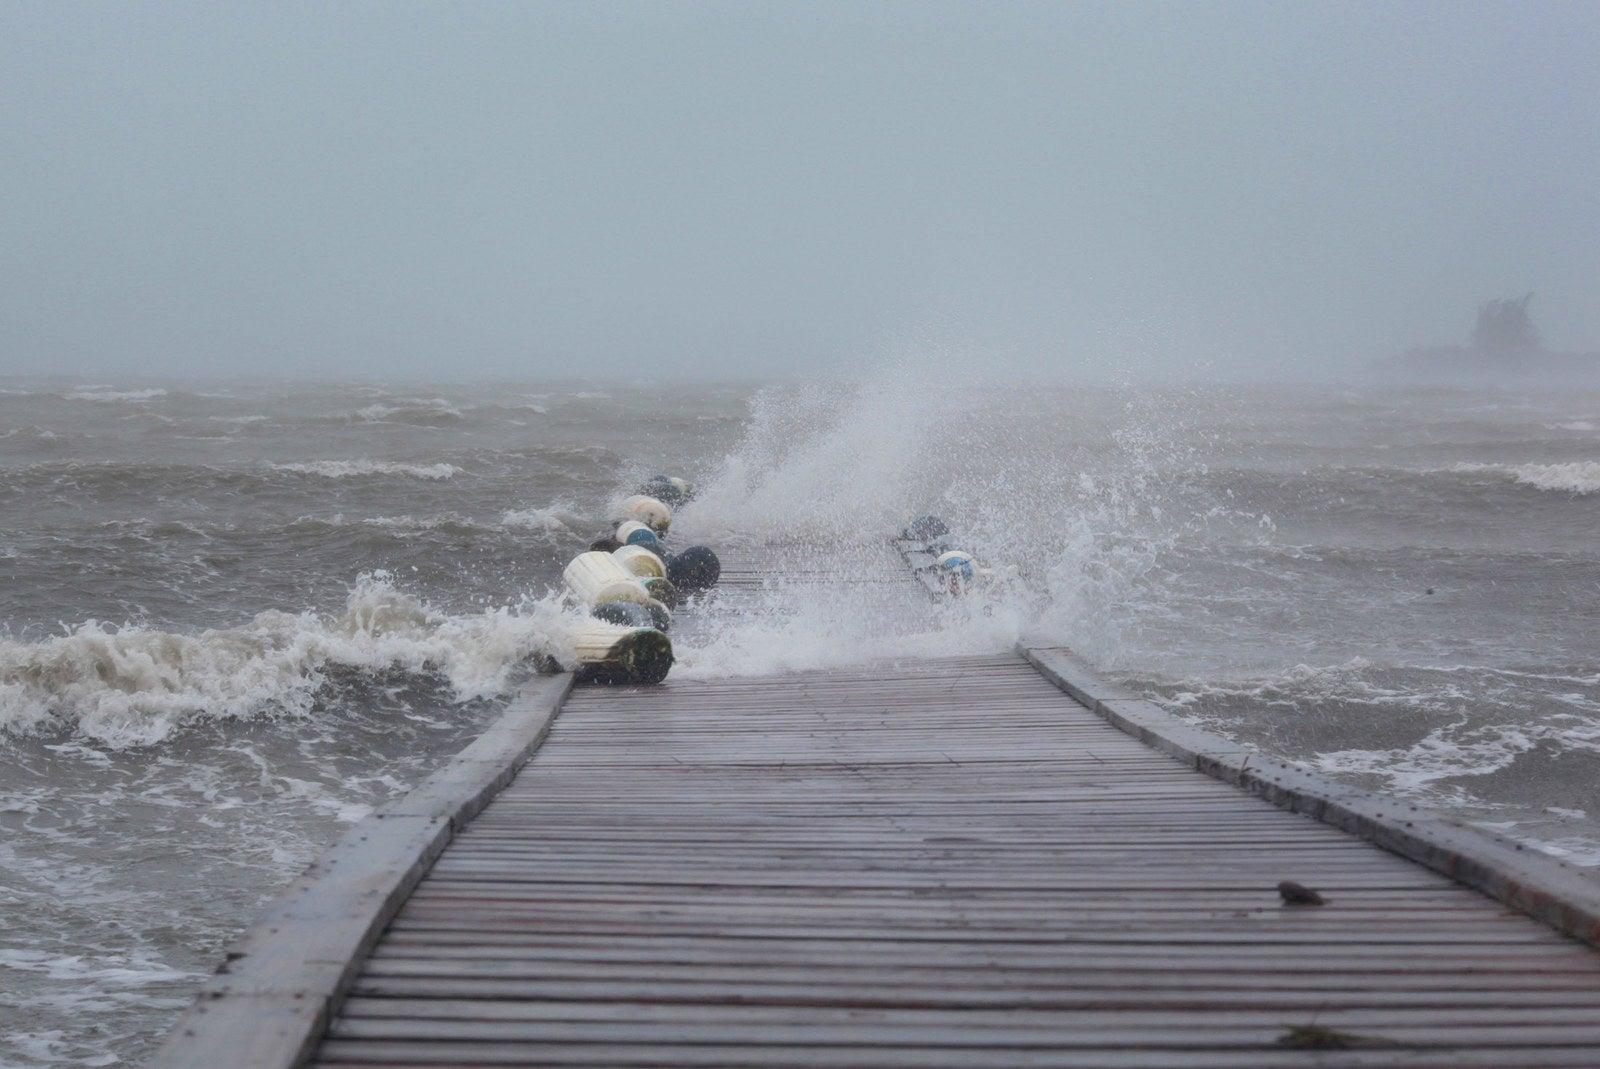 Waves break over a dock as Hurricane Irma slammed across islands in the northern Caribbean, in Fajardo, Puerto Rico, on Wednesday.